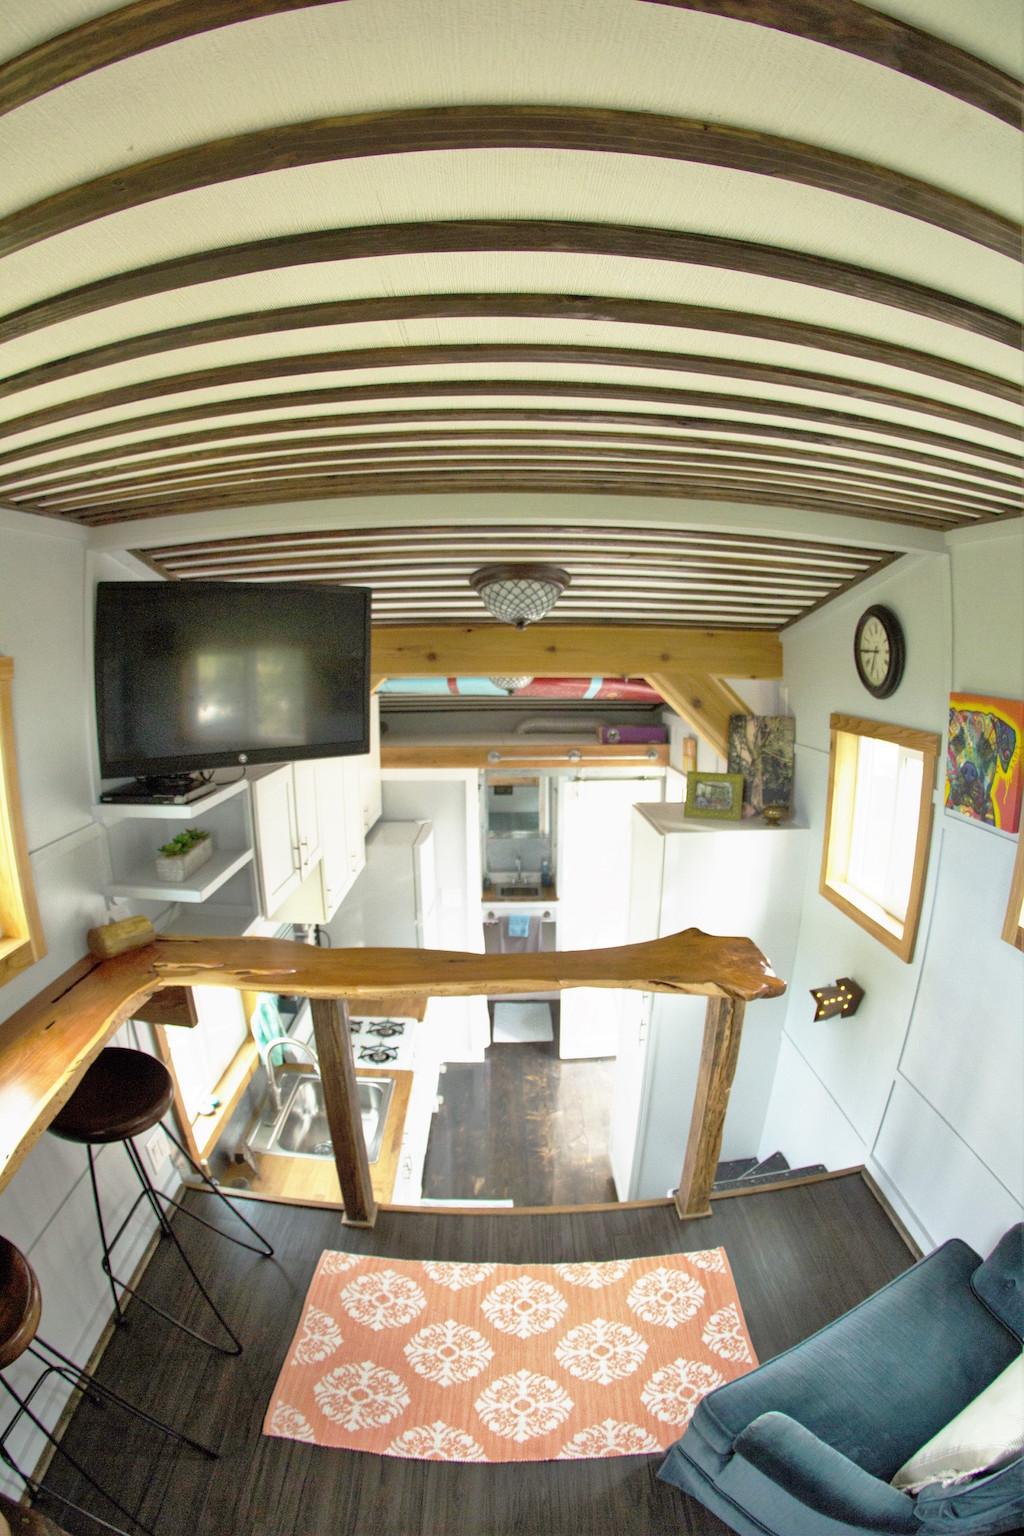 raw-design-creative-tiny-house-8